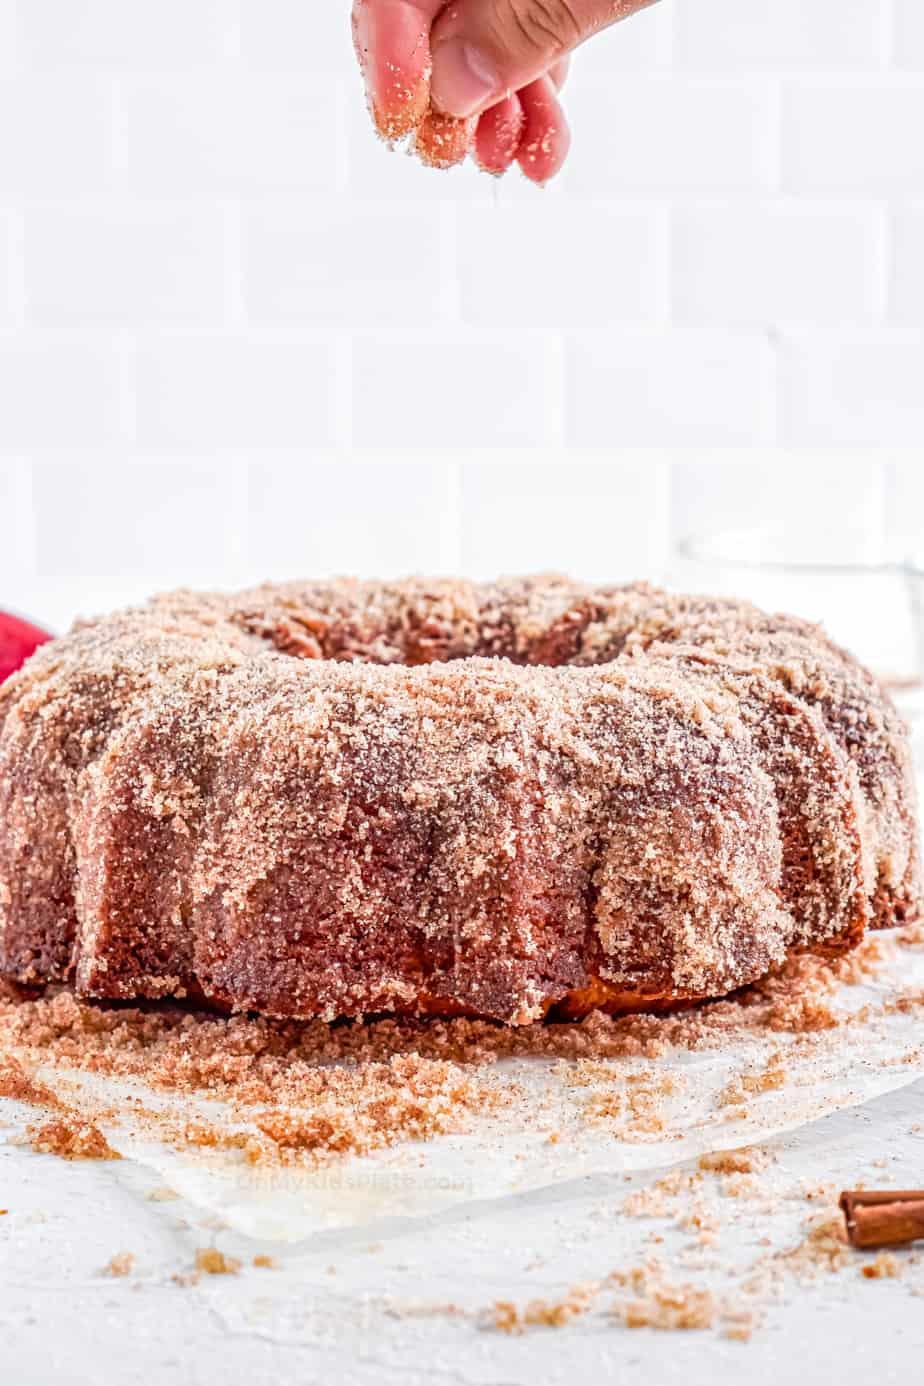 Sprinkling cinnamon sugar over the entire apple cider doughnut cake